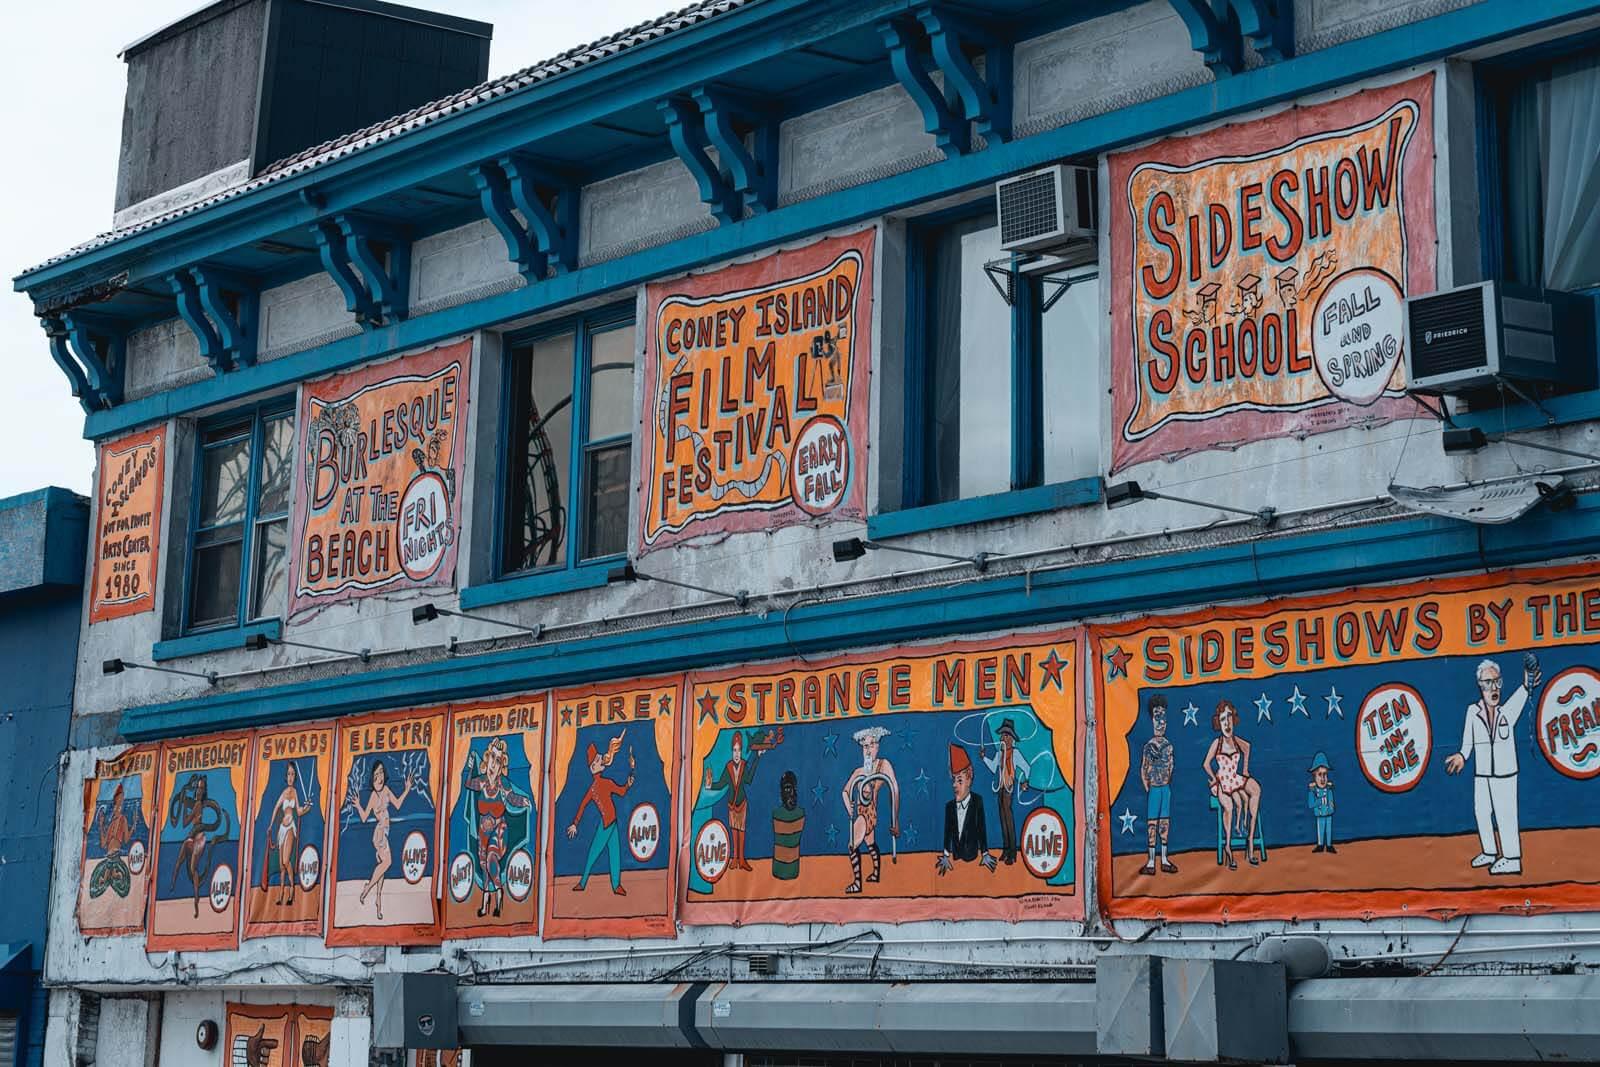 Coney Island Museum in Coney Island